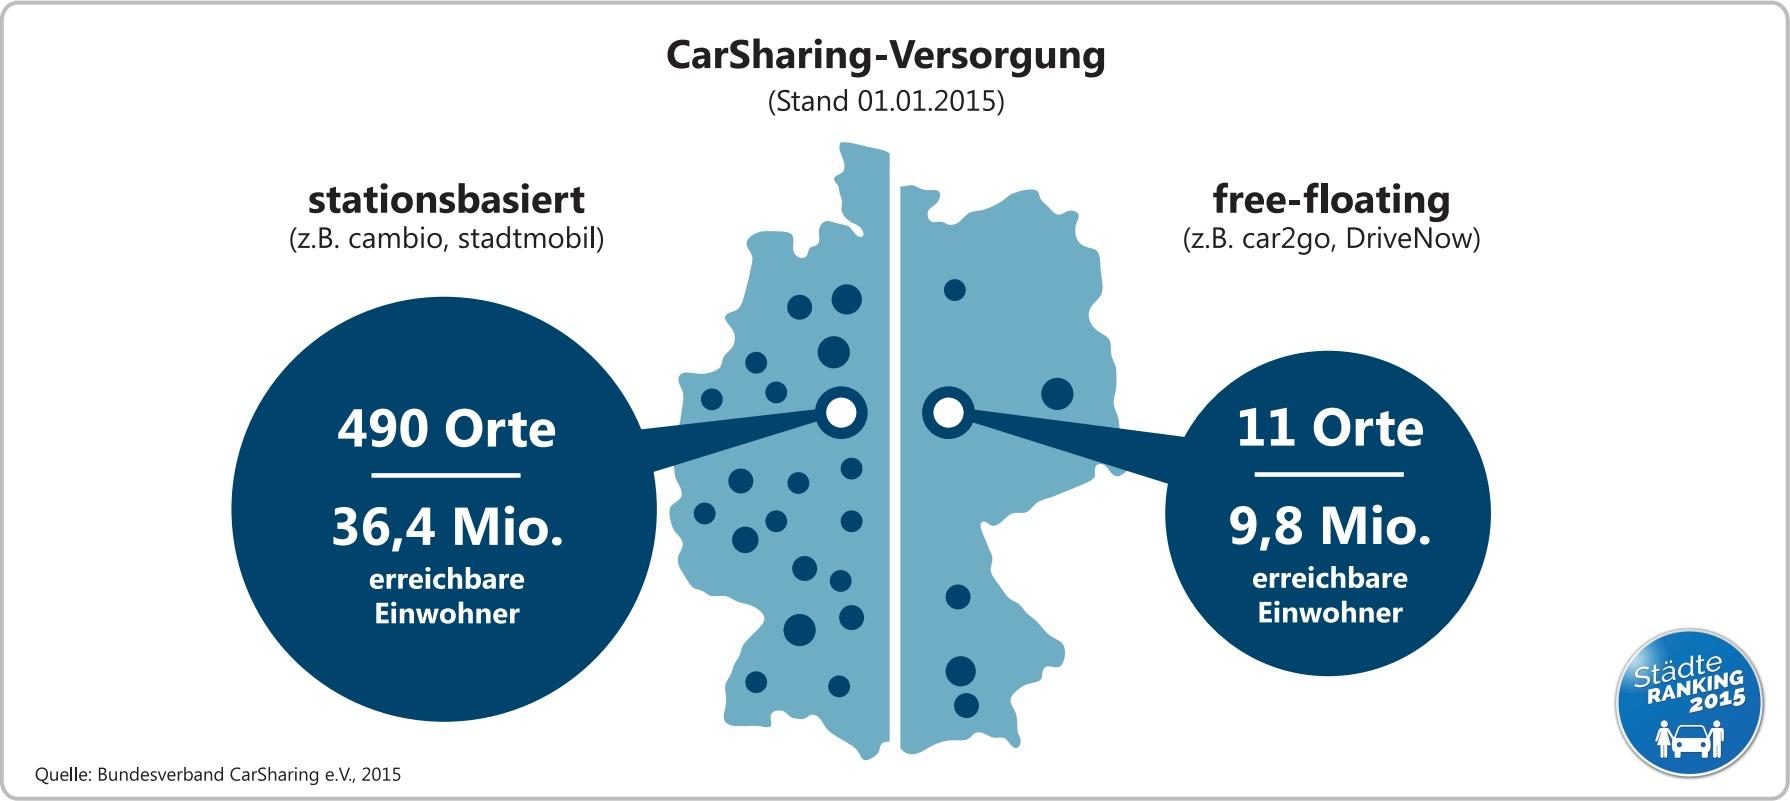 carsharing-versorgung-2015